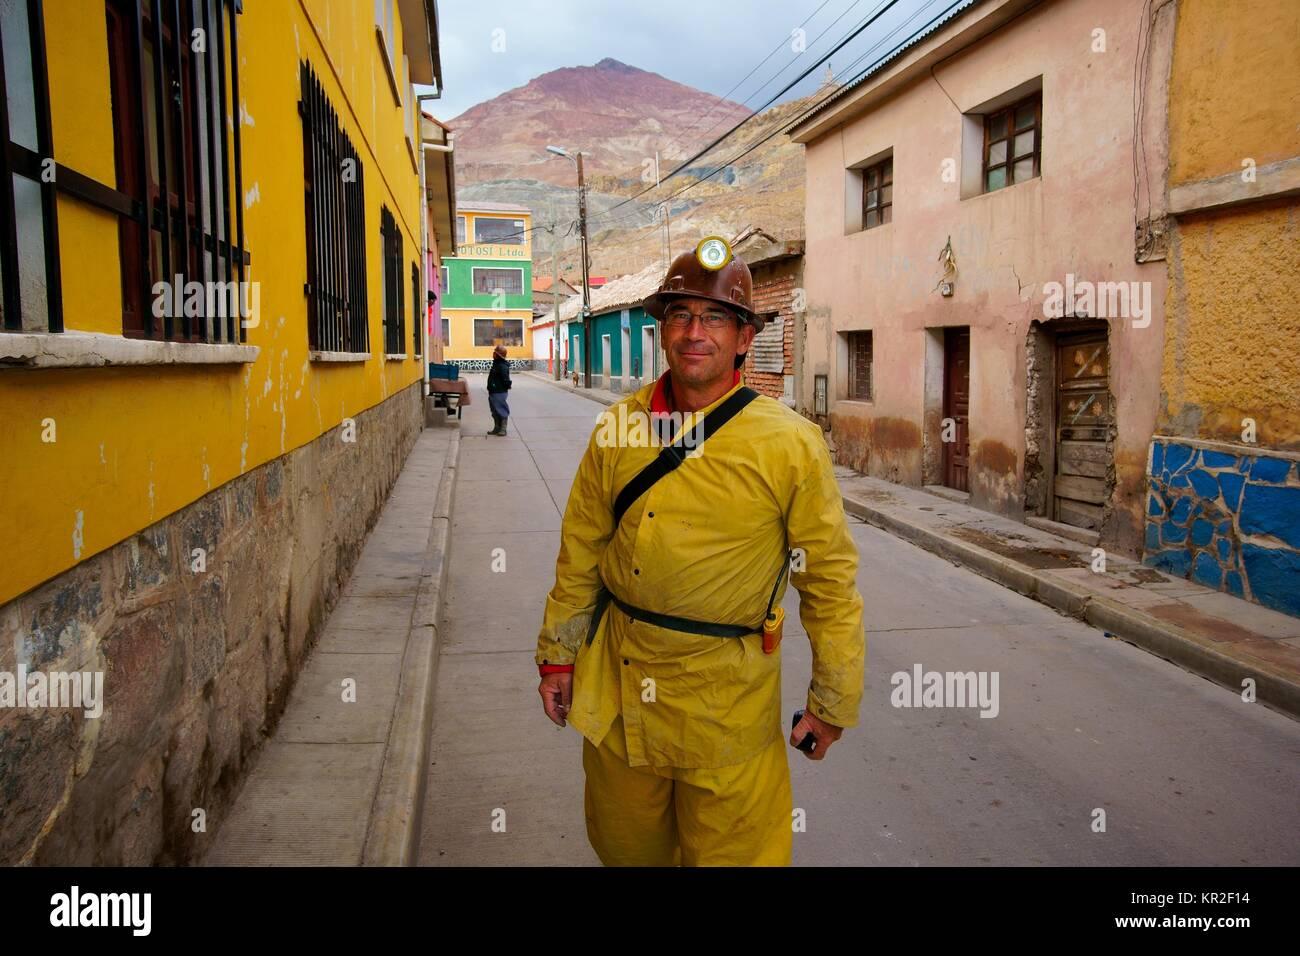 Tourist in protective clothing, mine-tour in the Silver Mountain Cerro Rico, Potosí, Tomás Frías - Stock Image